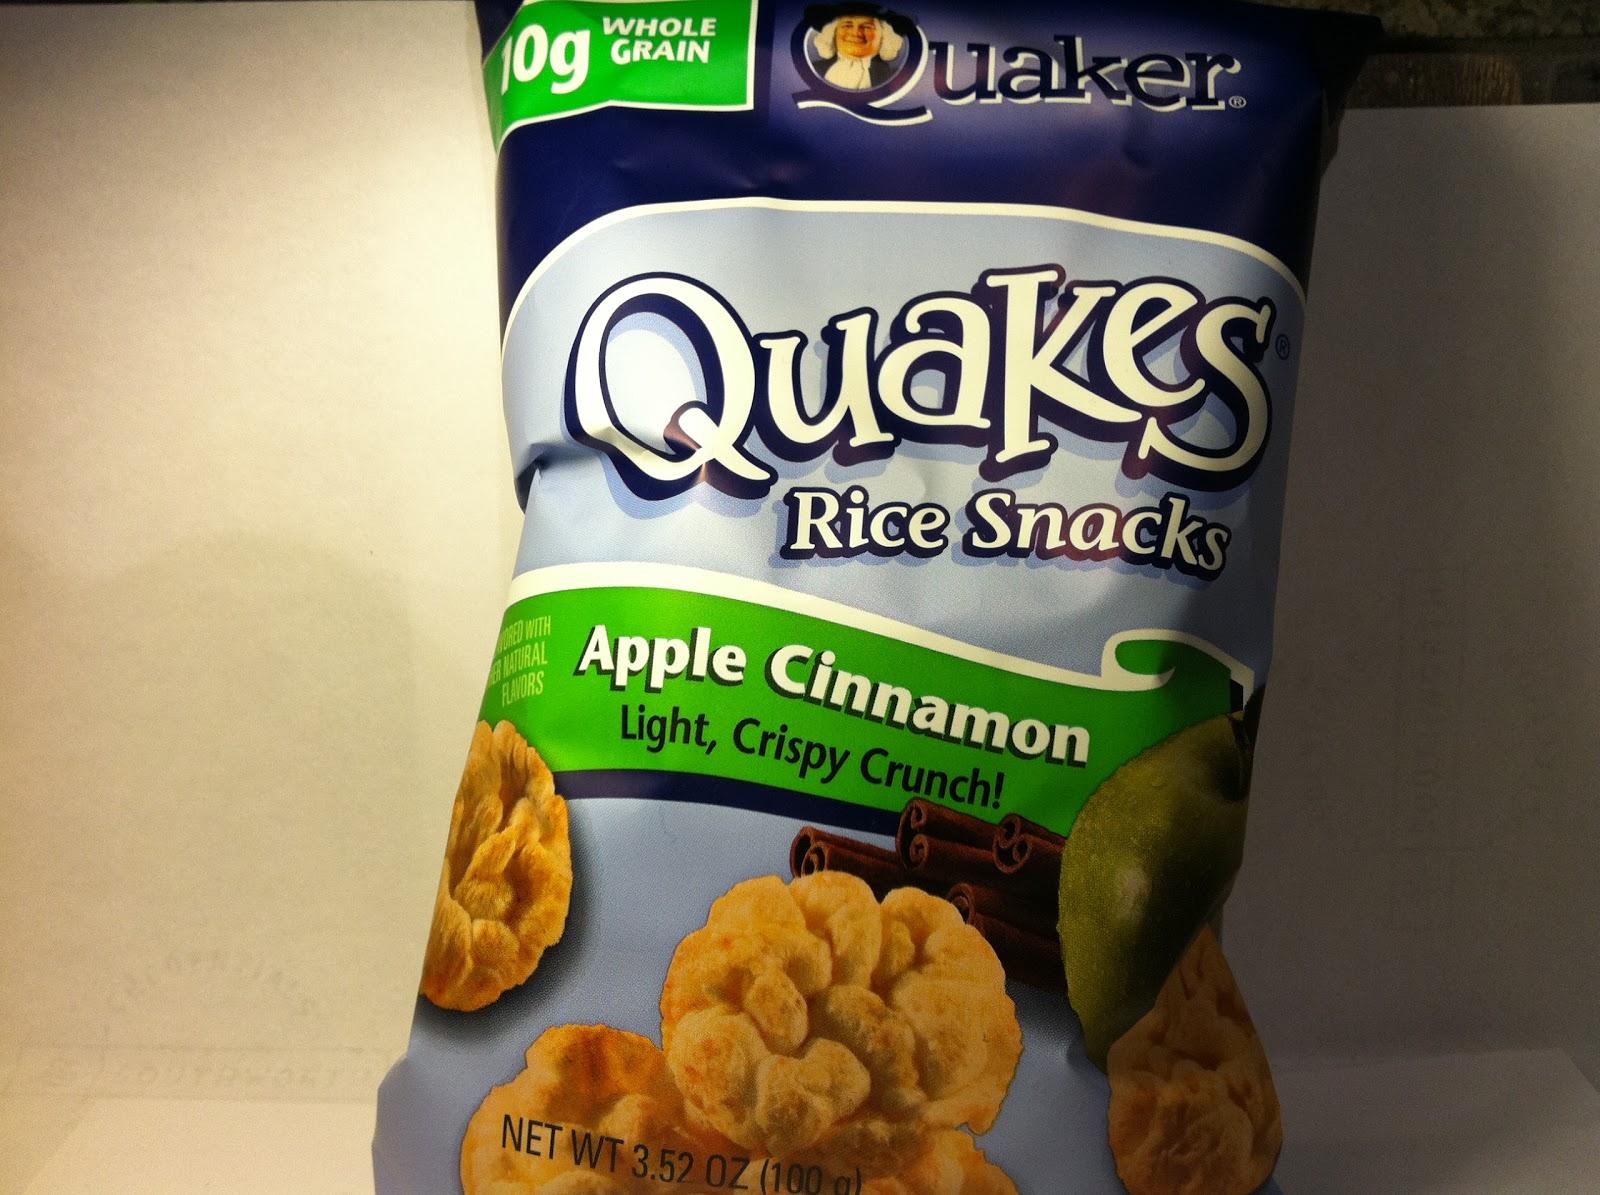 Where To Buy Quaker Apple Cinnamon Rice Cakes